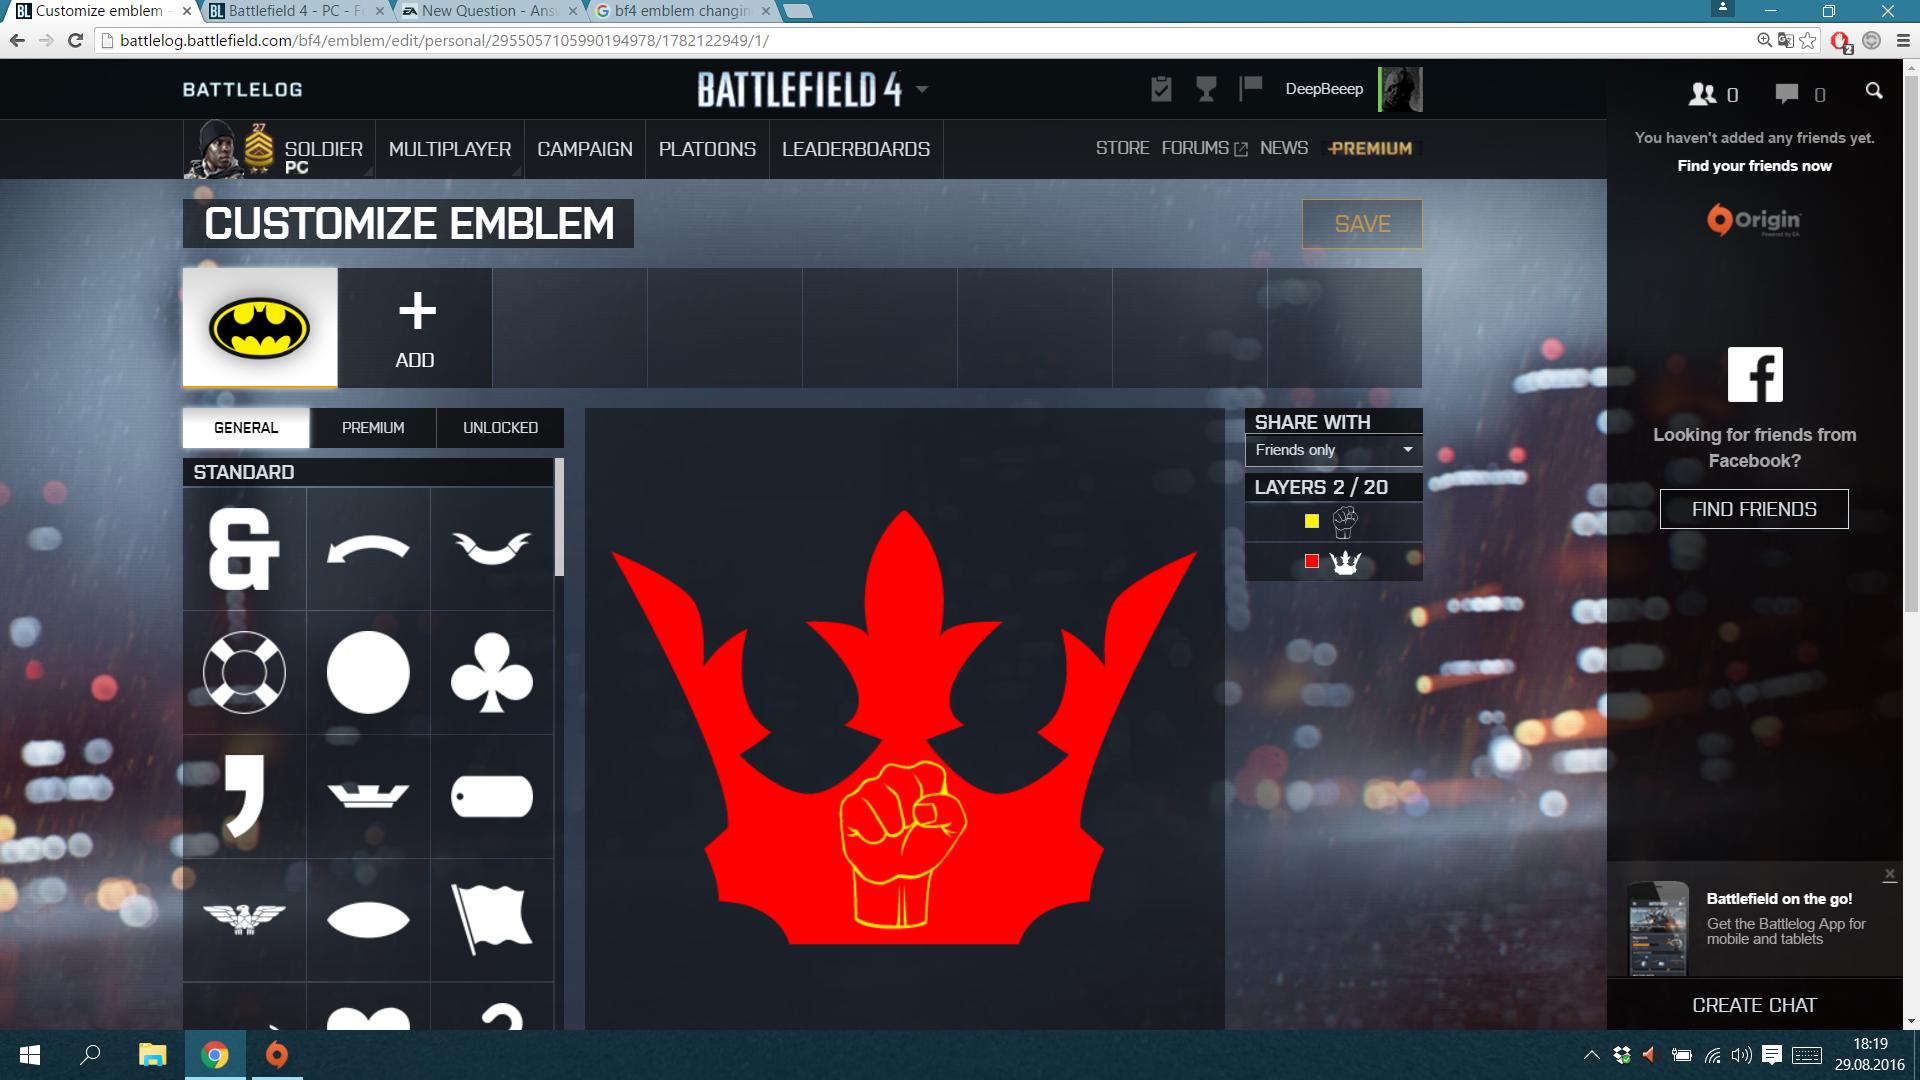 BF4 emblem changing itself - Answer HQ